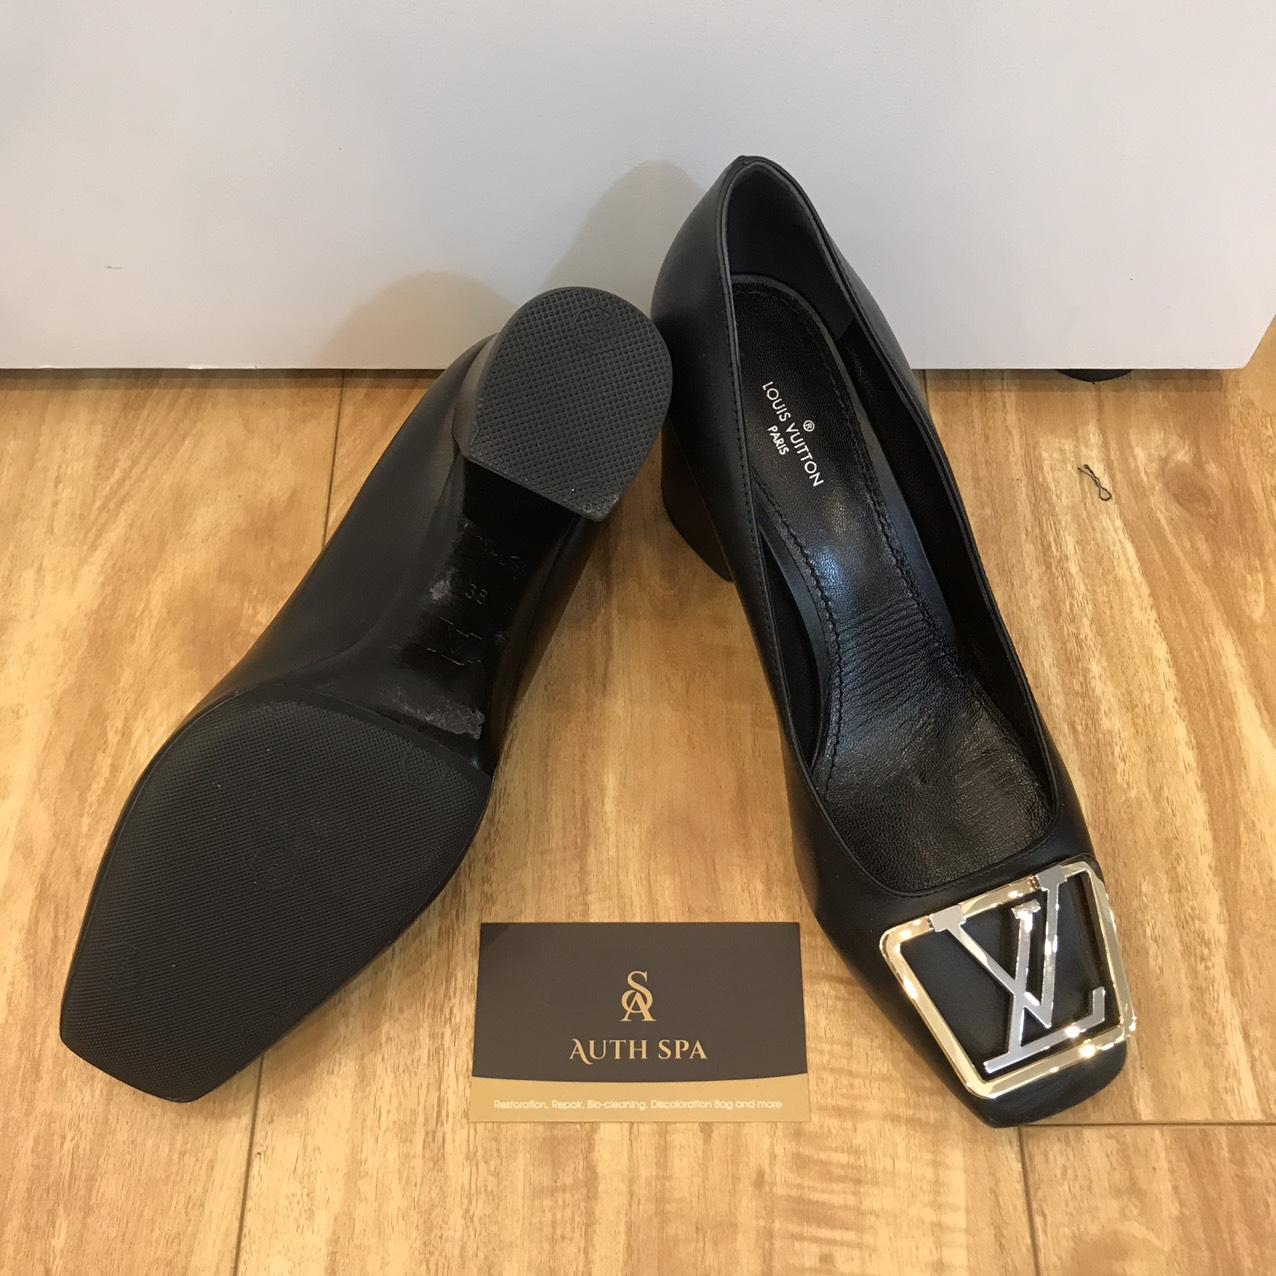 Sửa Chữa Giày Dép Gucci, Chanel, Louis Vuitton, Hermes ... 19